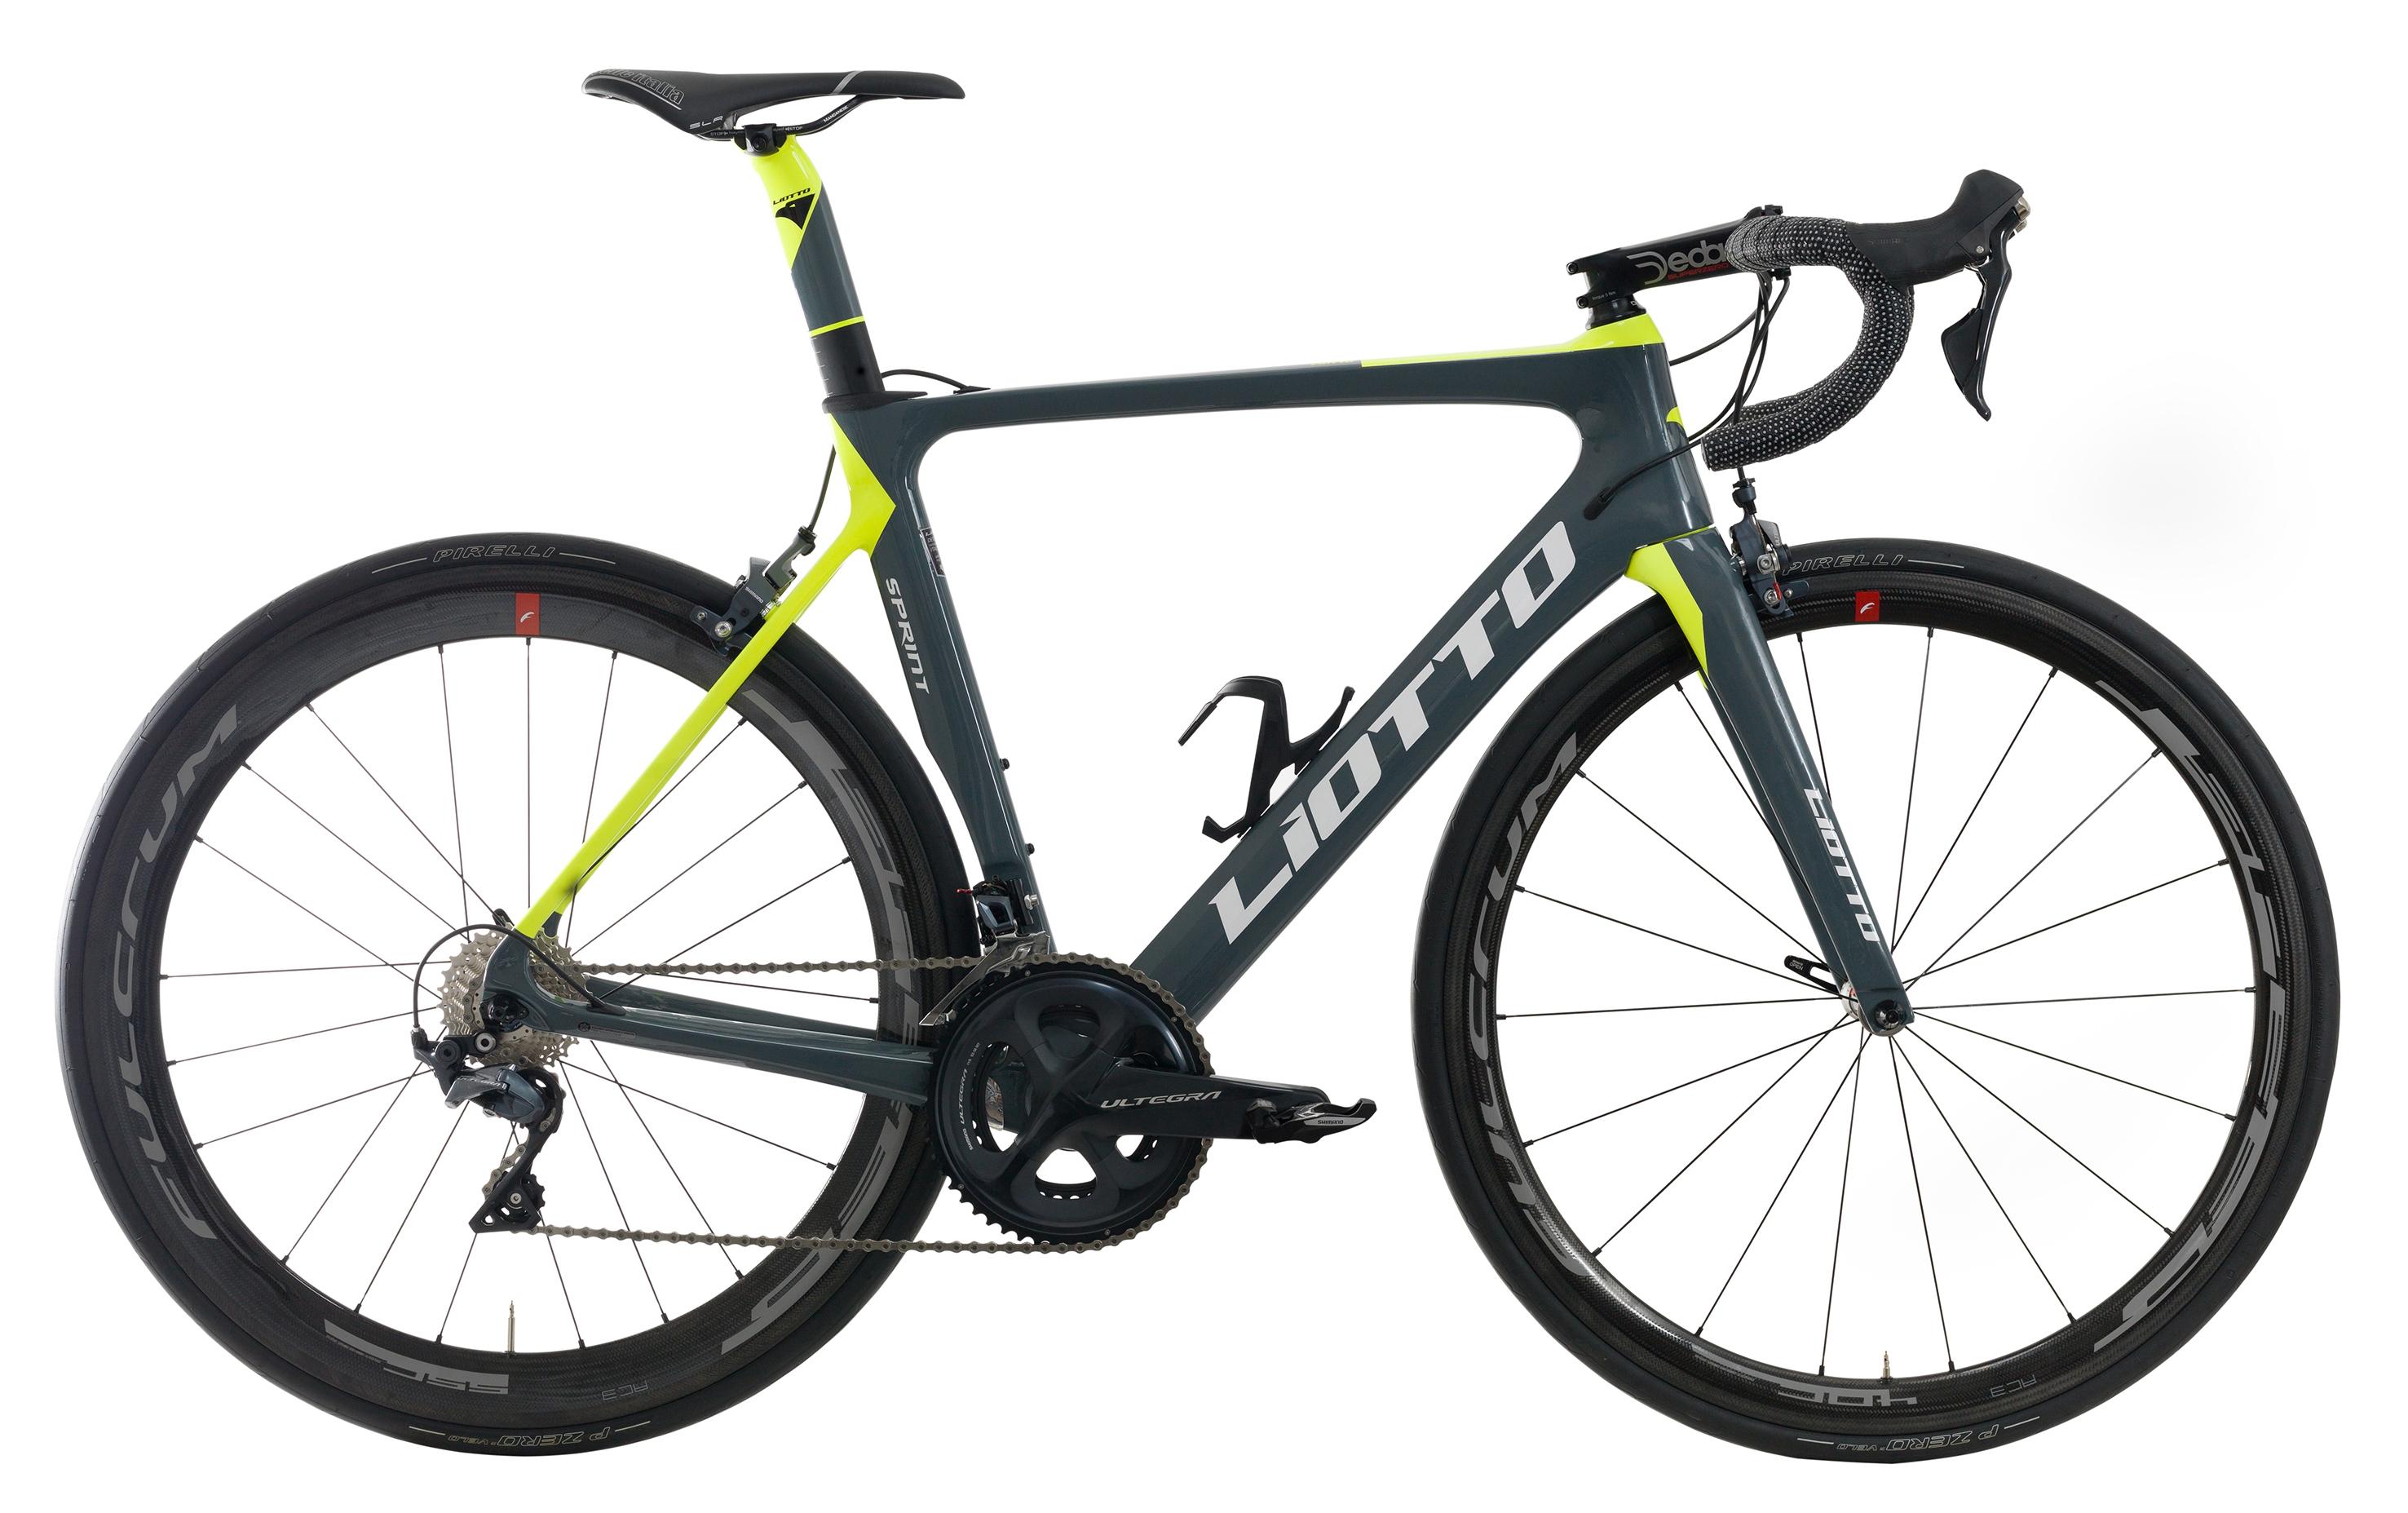 CS Cicli Liotto - La Nuova Sprint omologata UCI